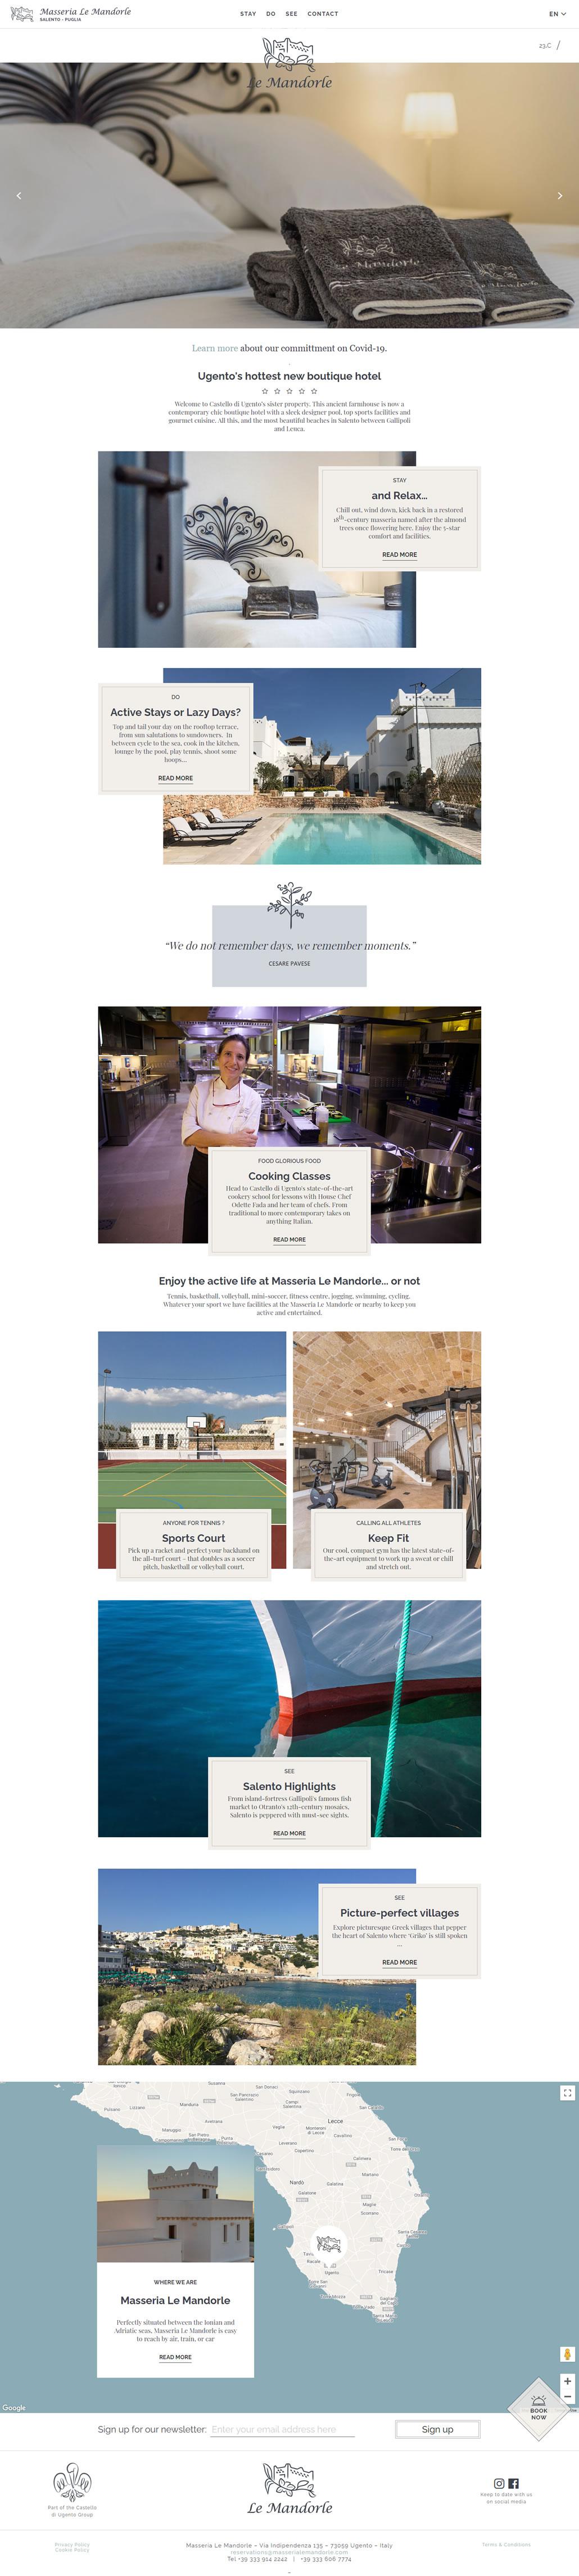 Masseria Le Mandorle built using WordPress, web design by Convoy Media